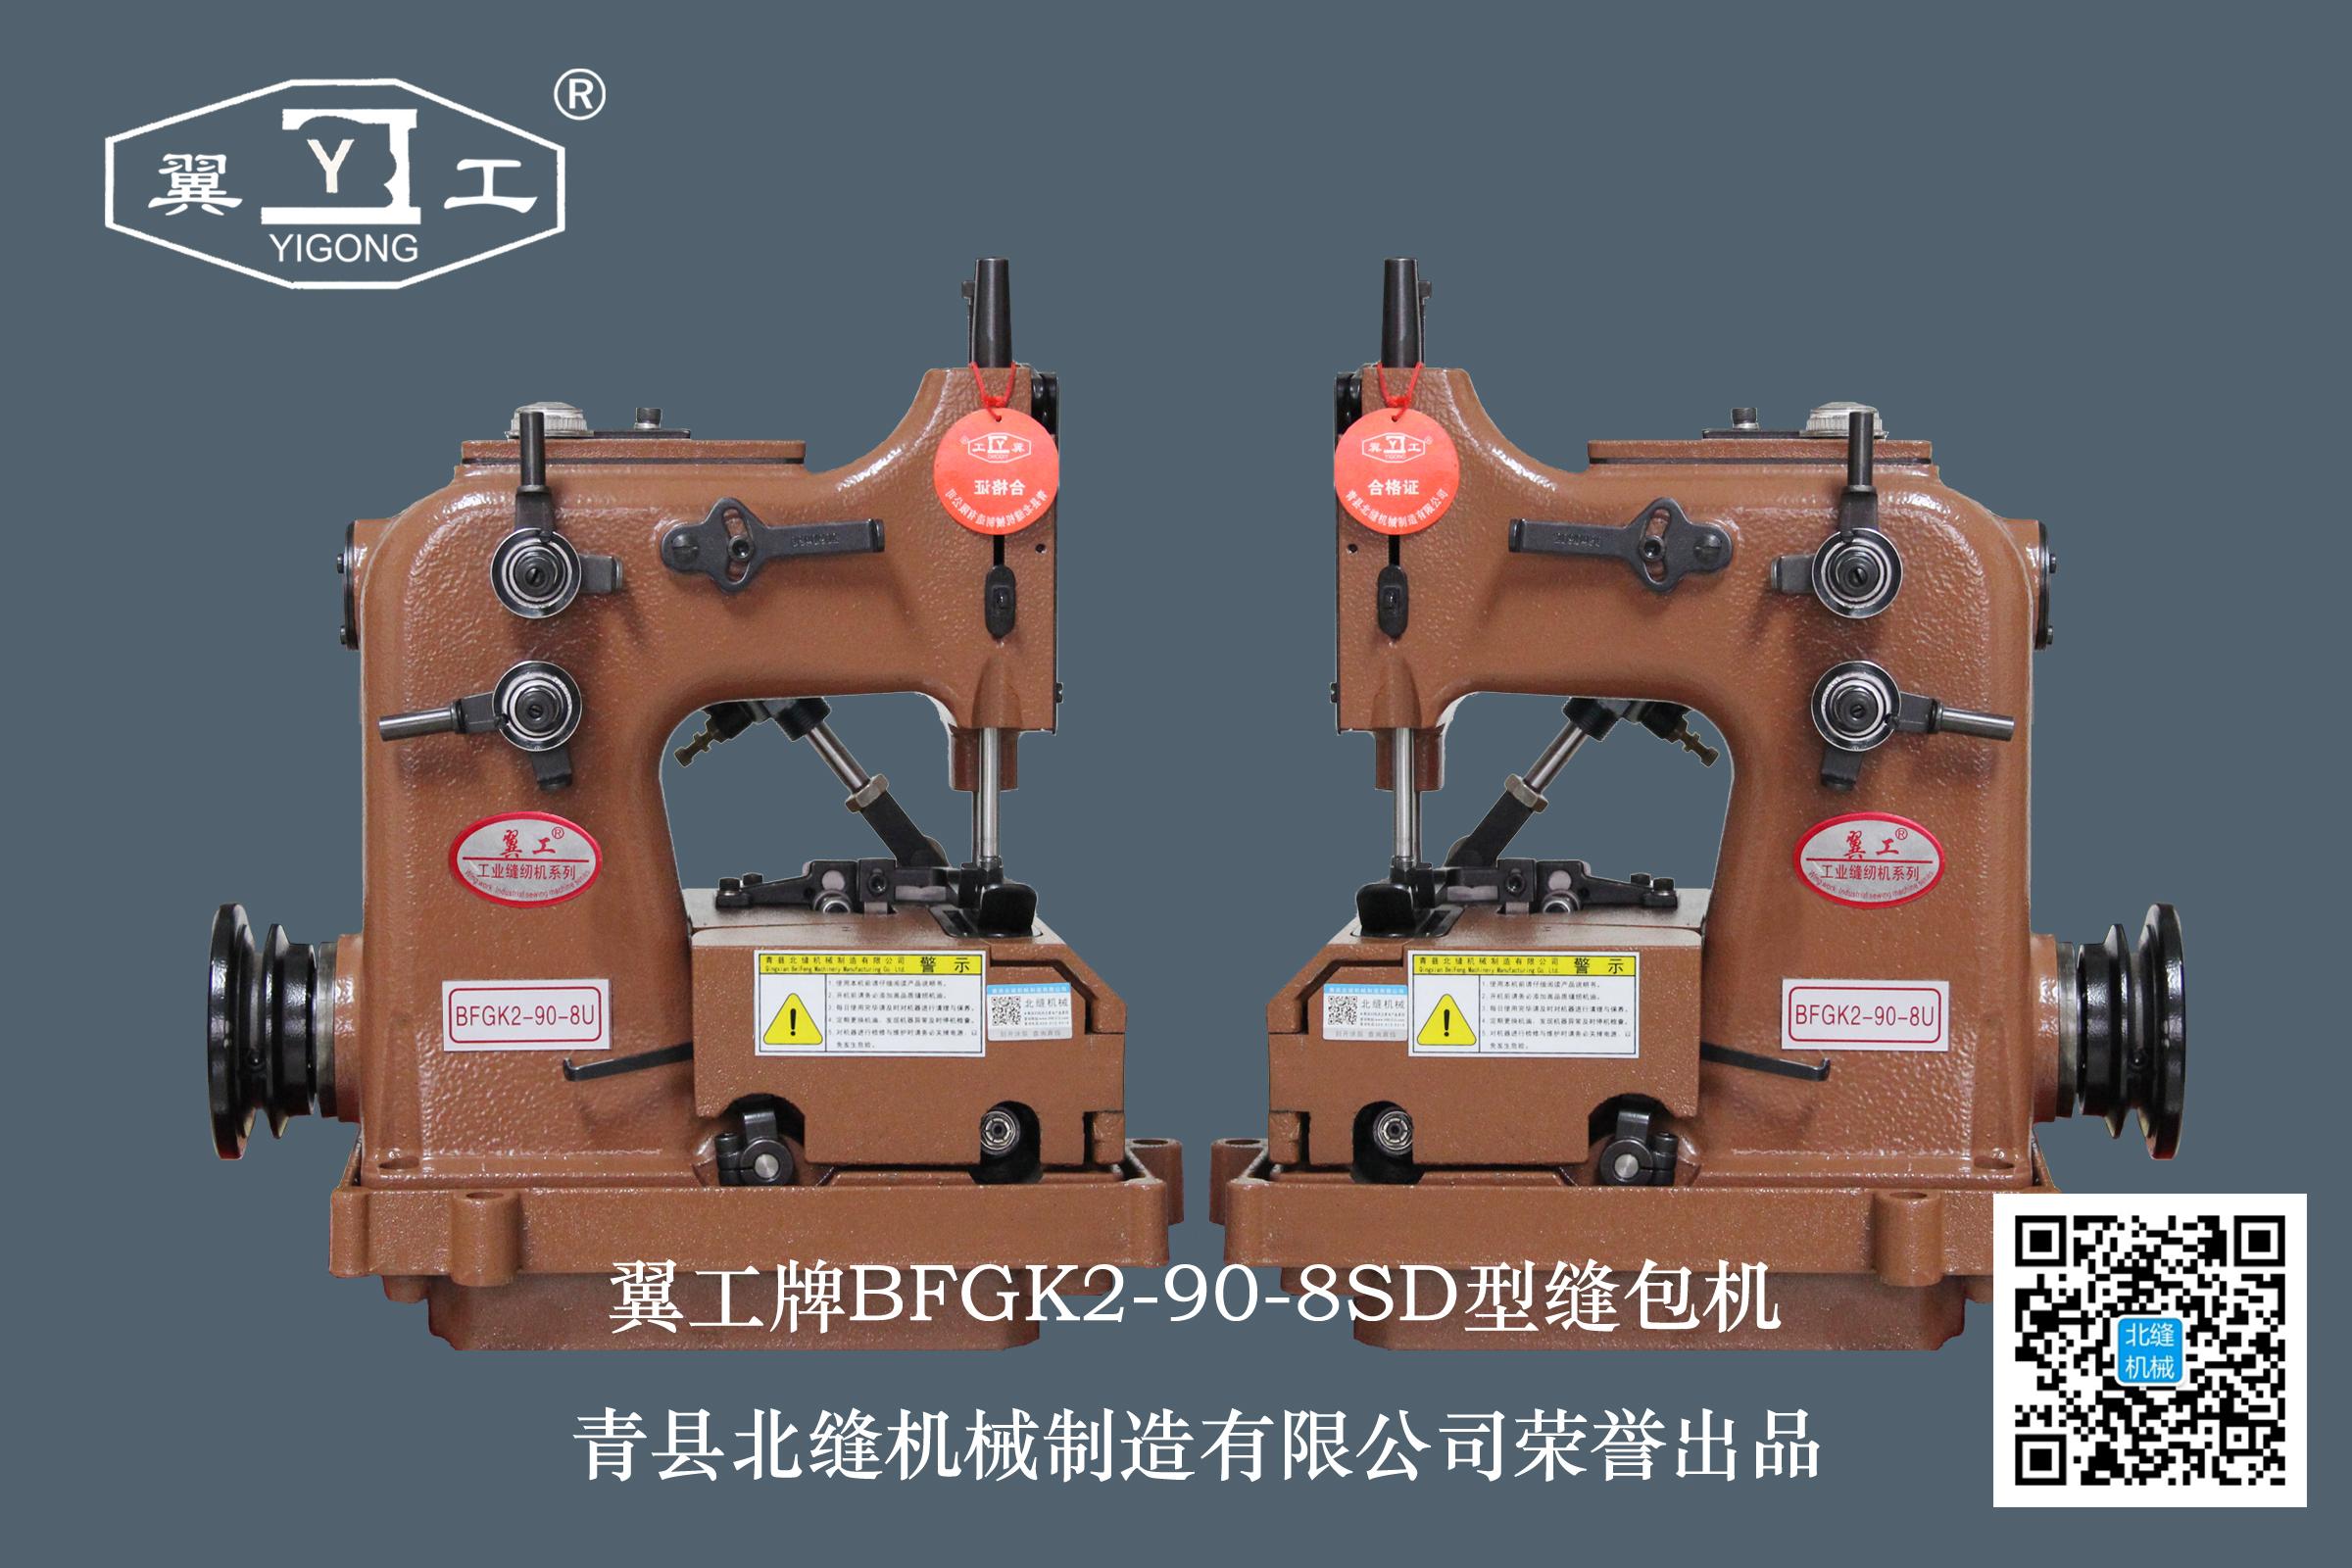 BFGK2-90-8U缝包机